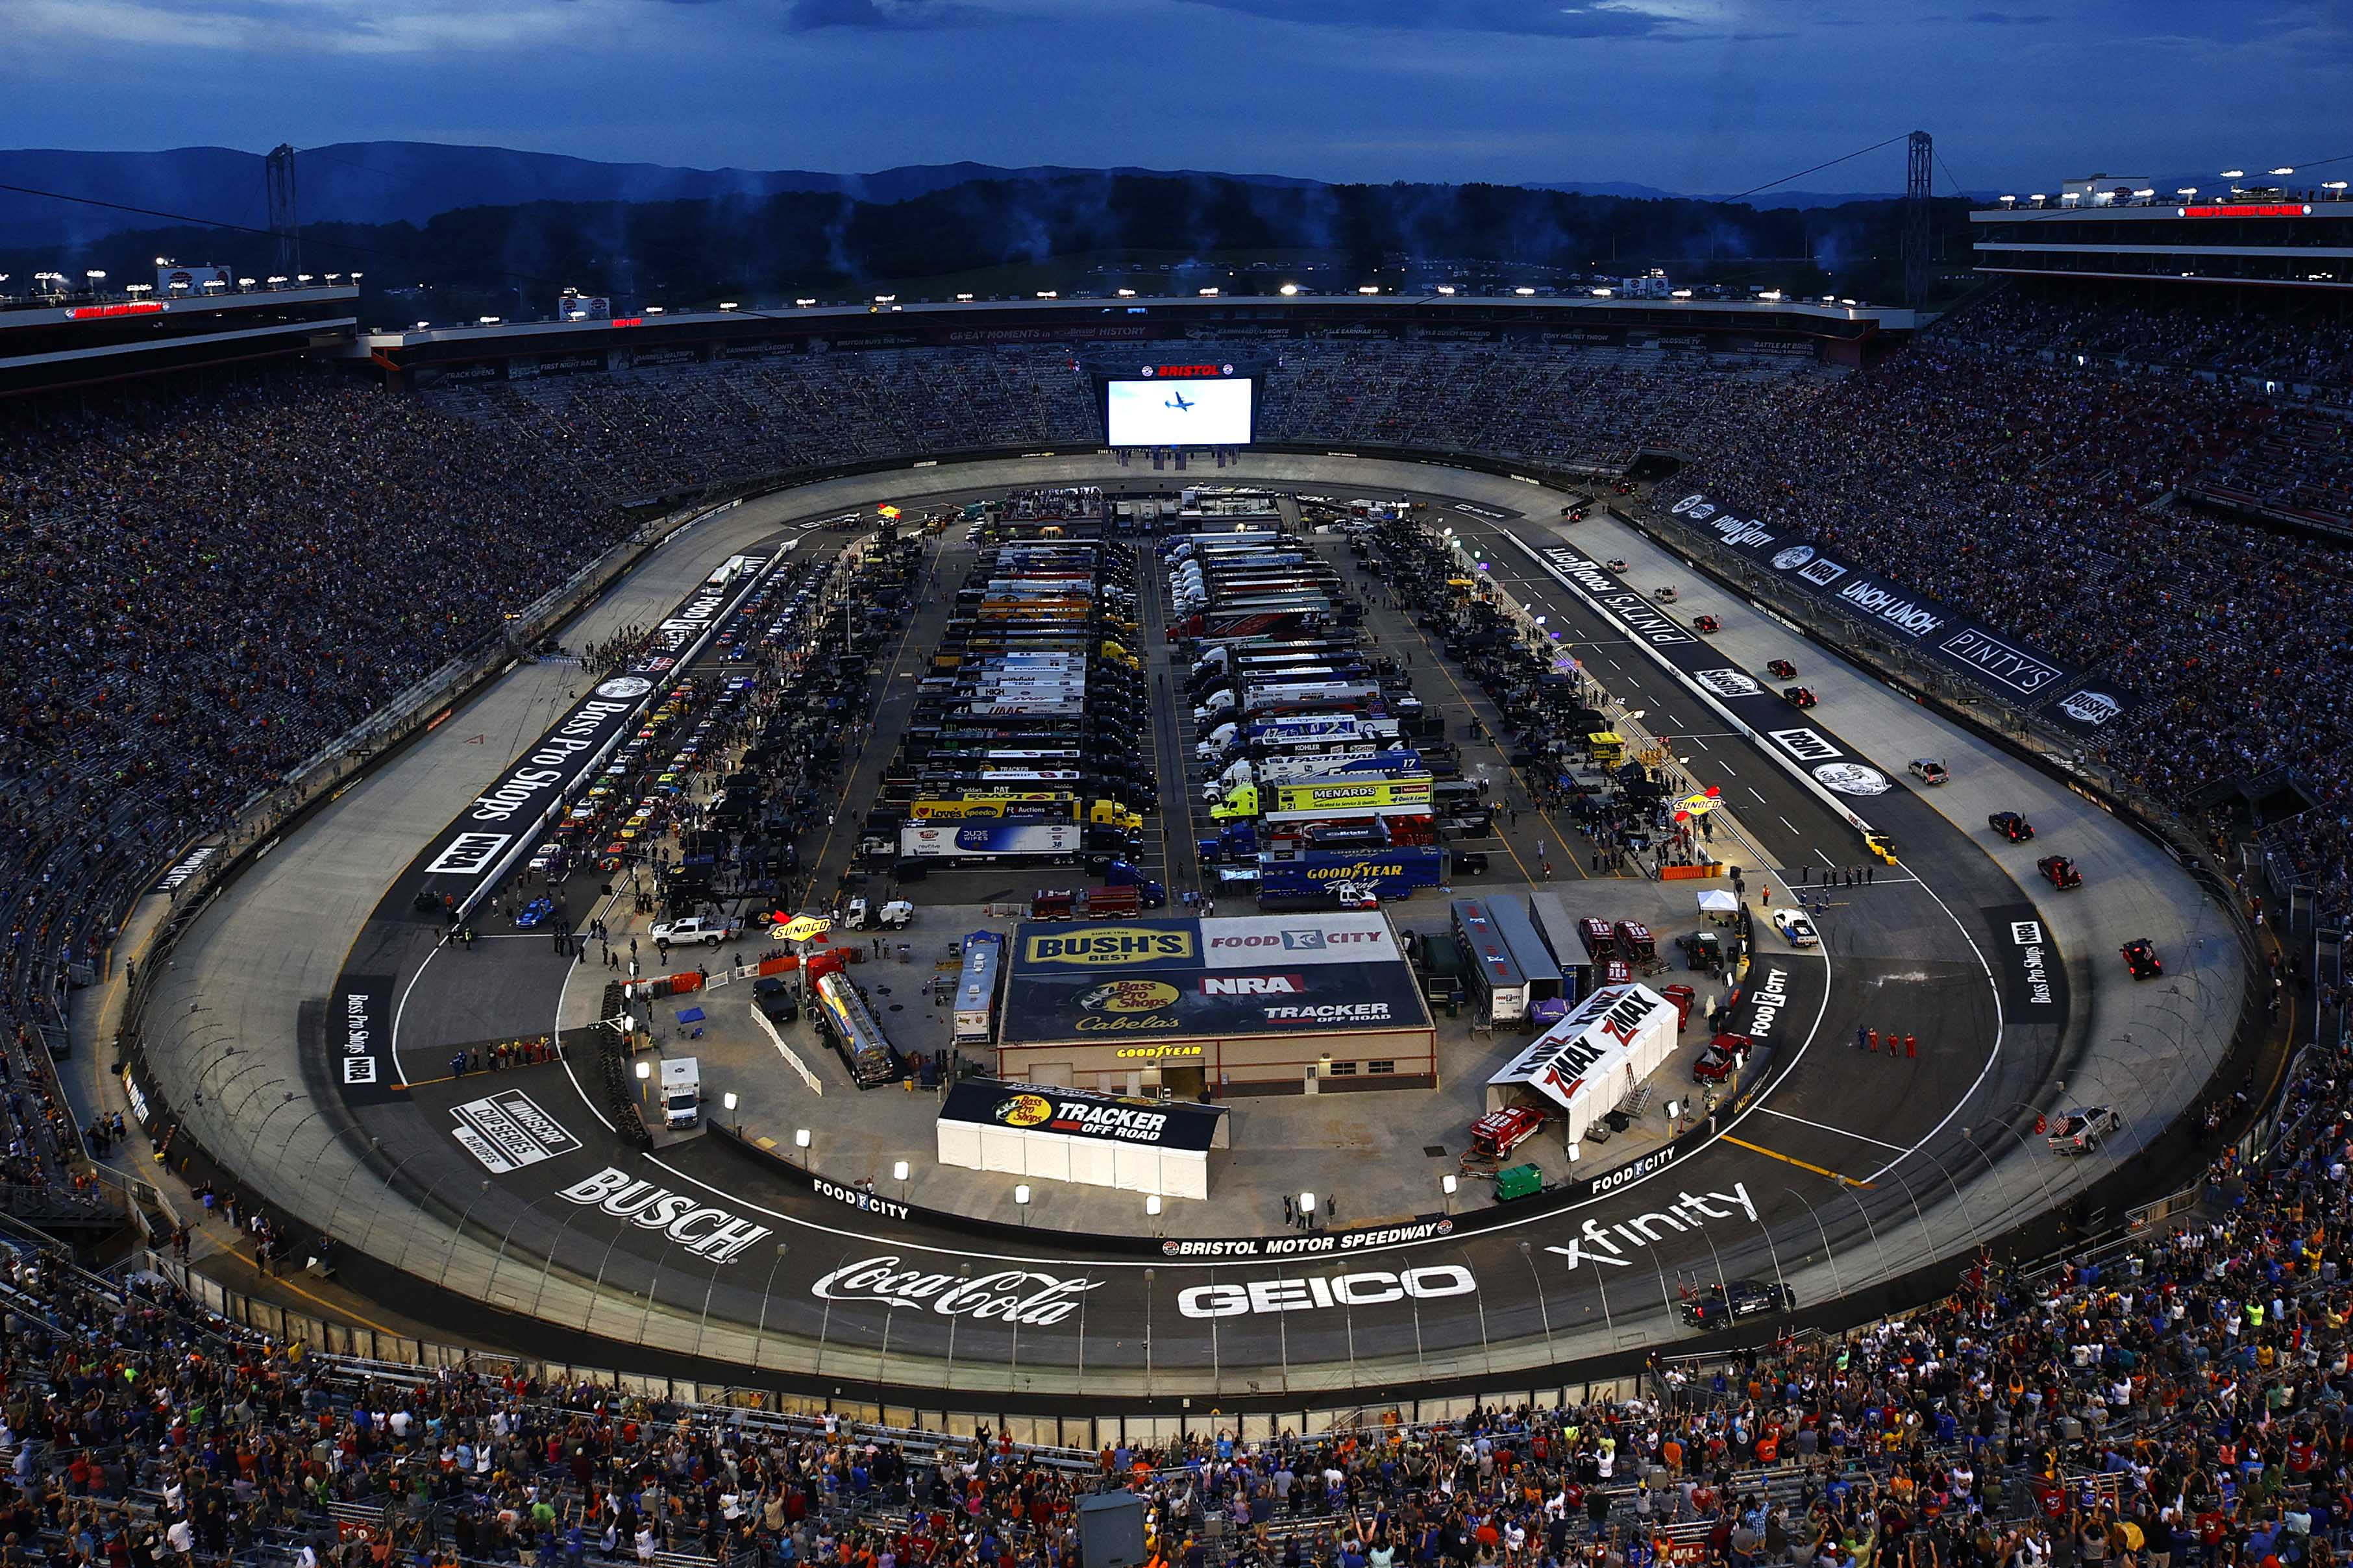 Bristol Motor Speedway - NASCAR Cup Series - Aerial Photo